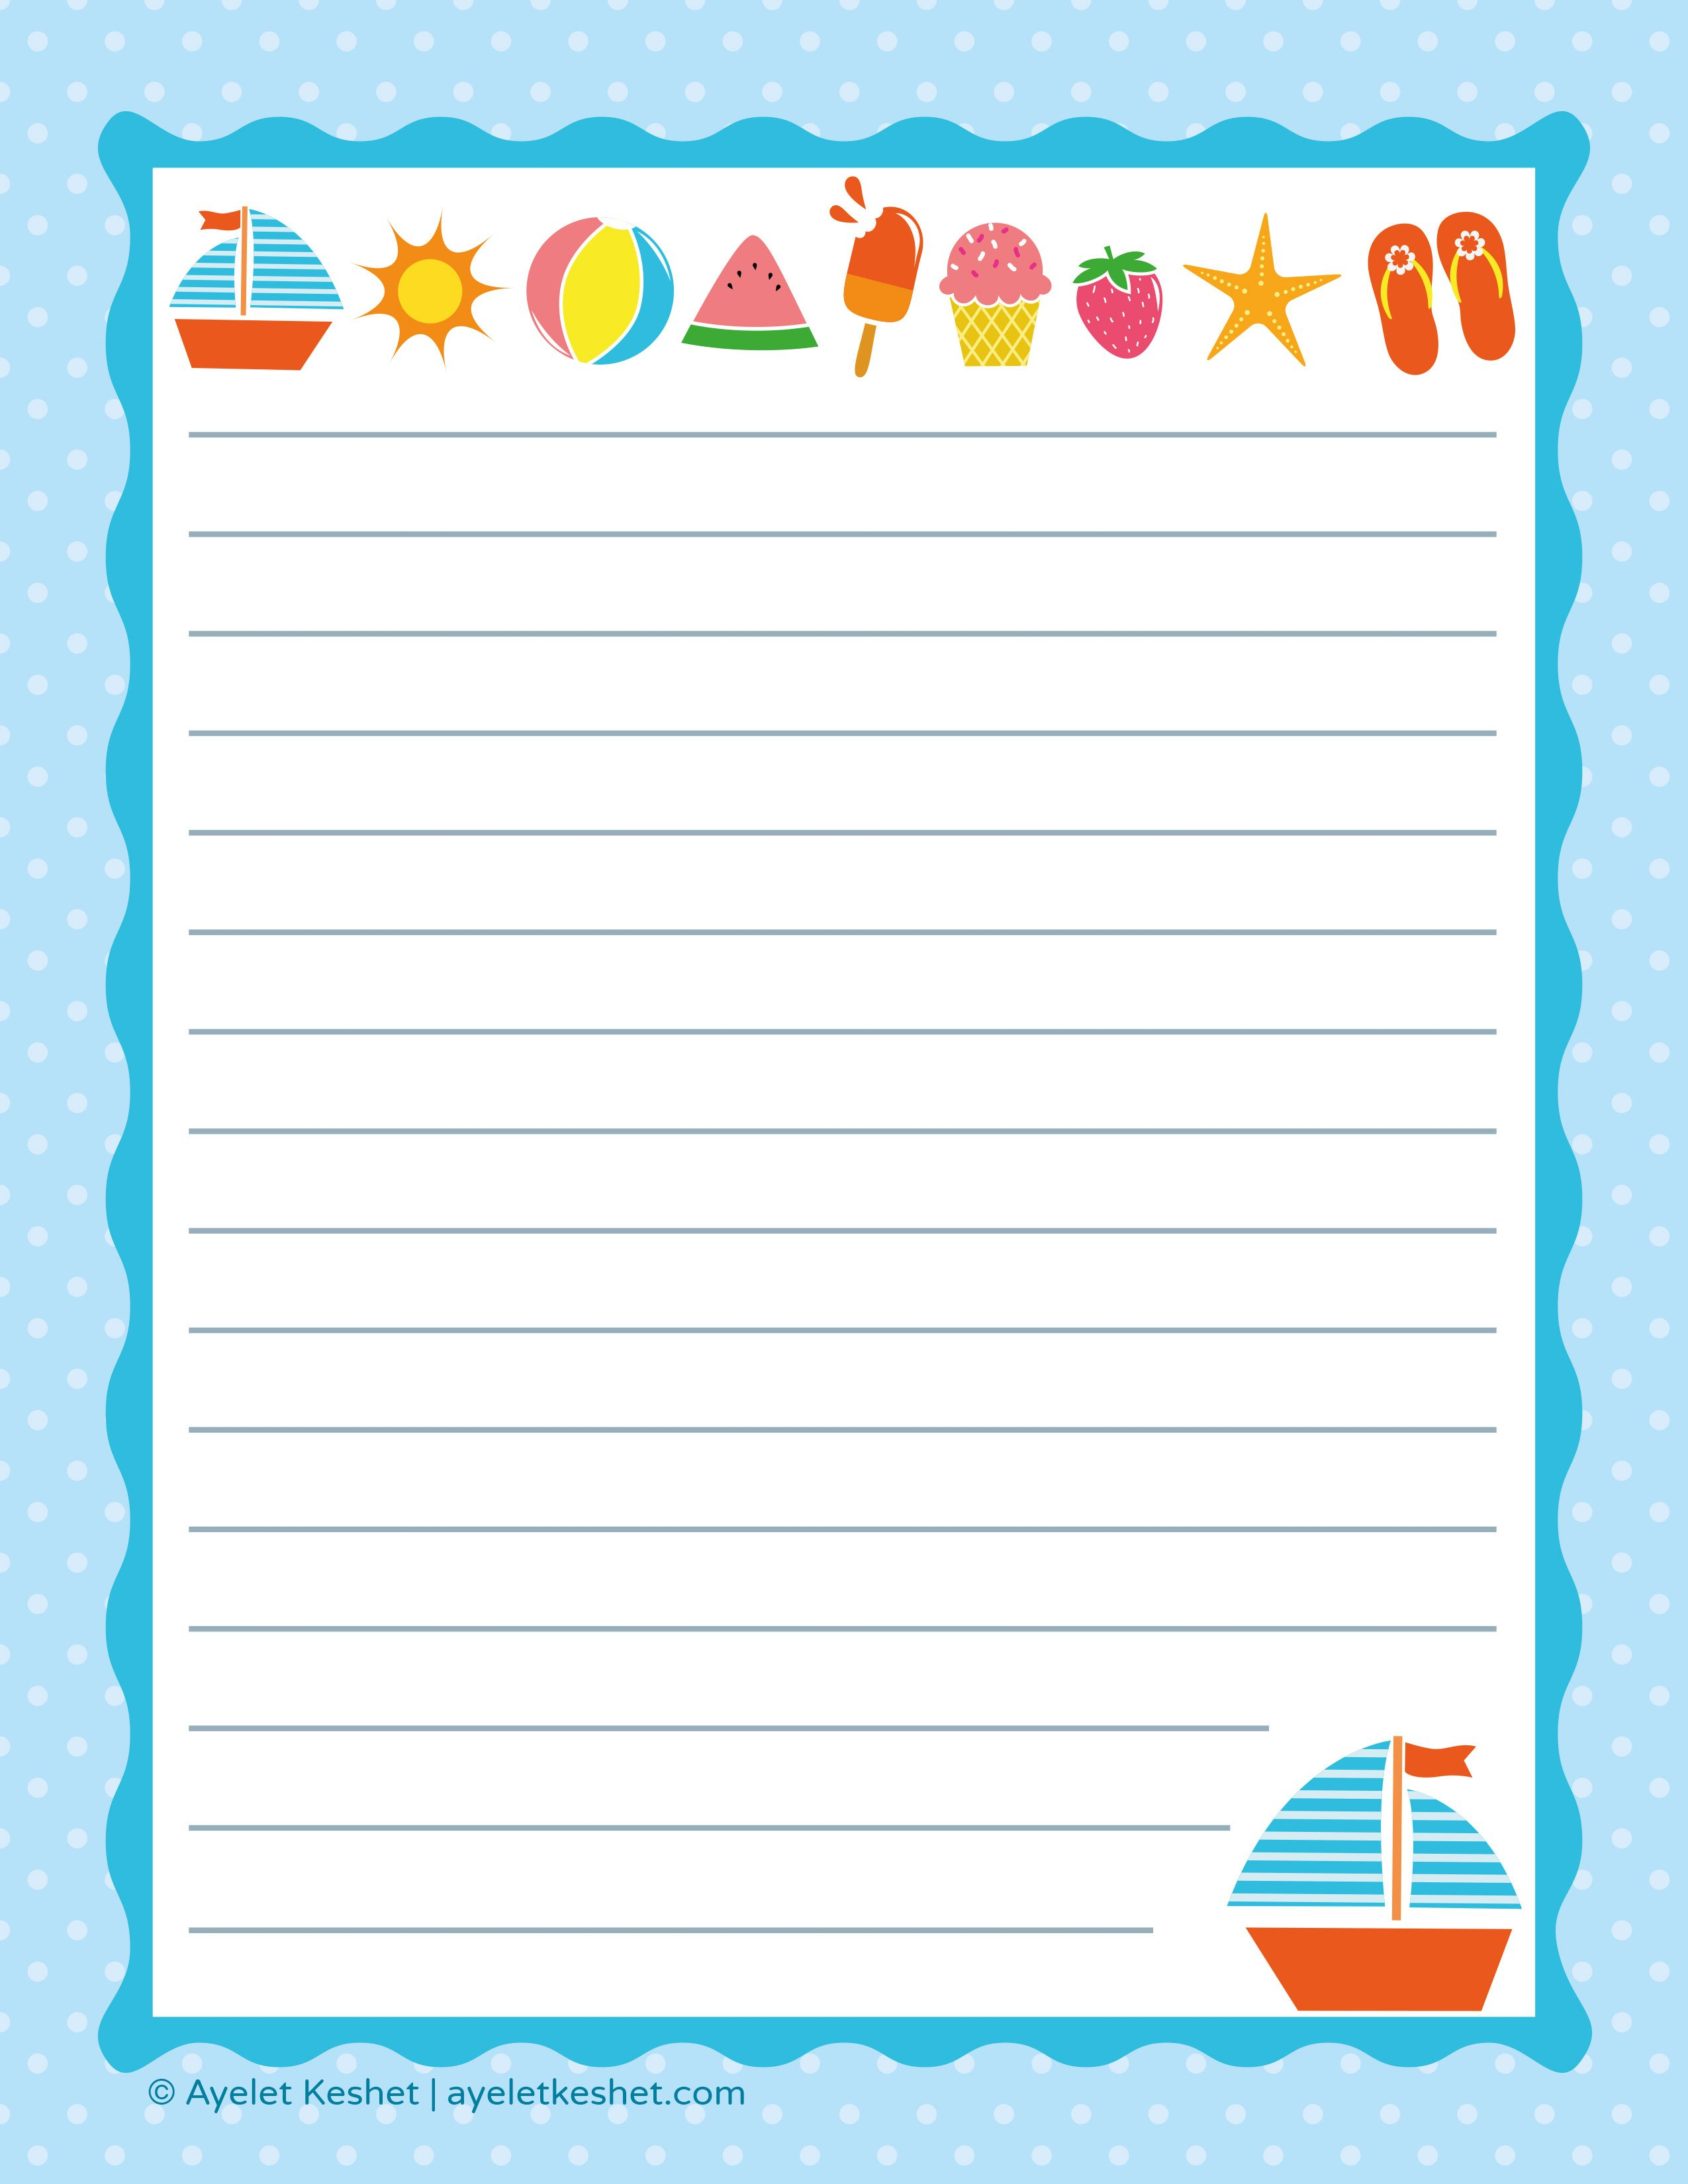 Free Printable Letter Paper - Ayelet Keshet - Free Printable Stationery Writing Paper